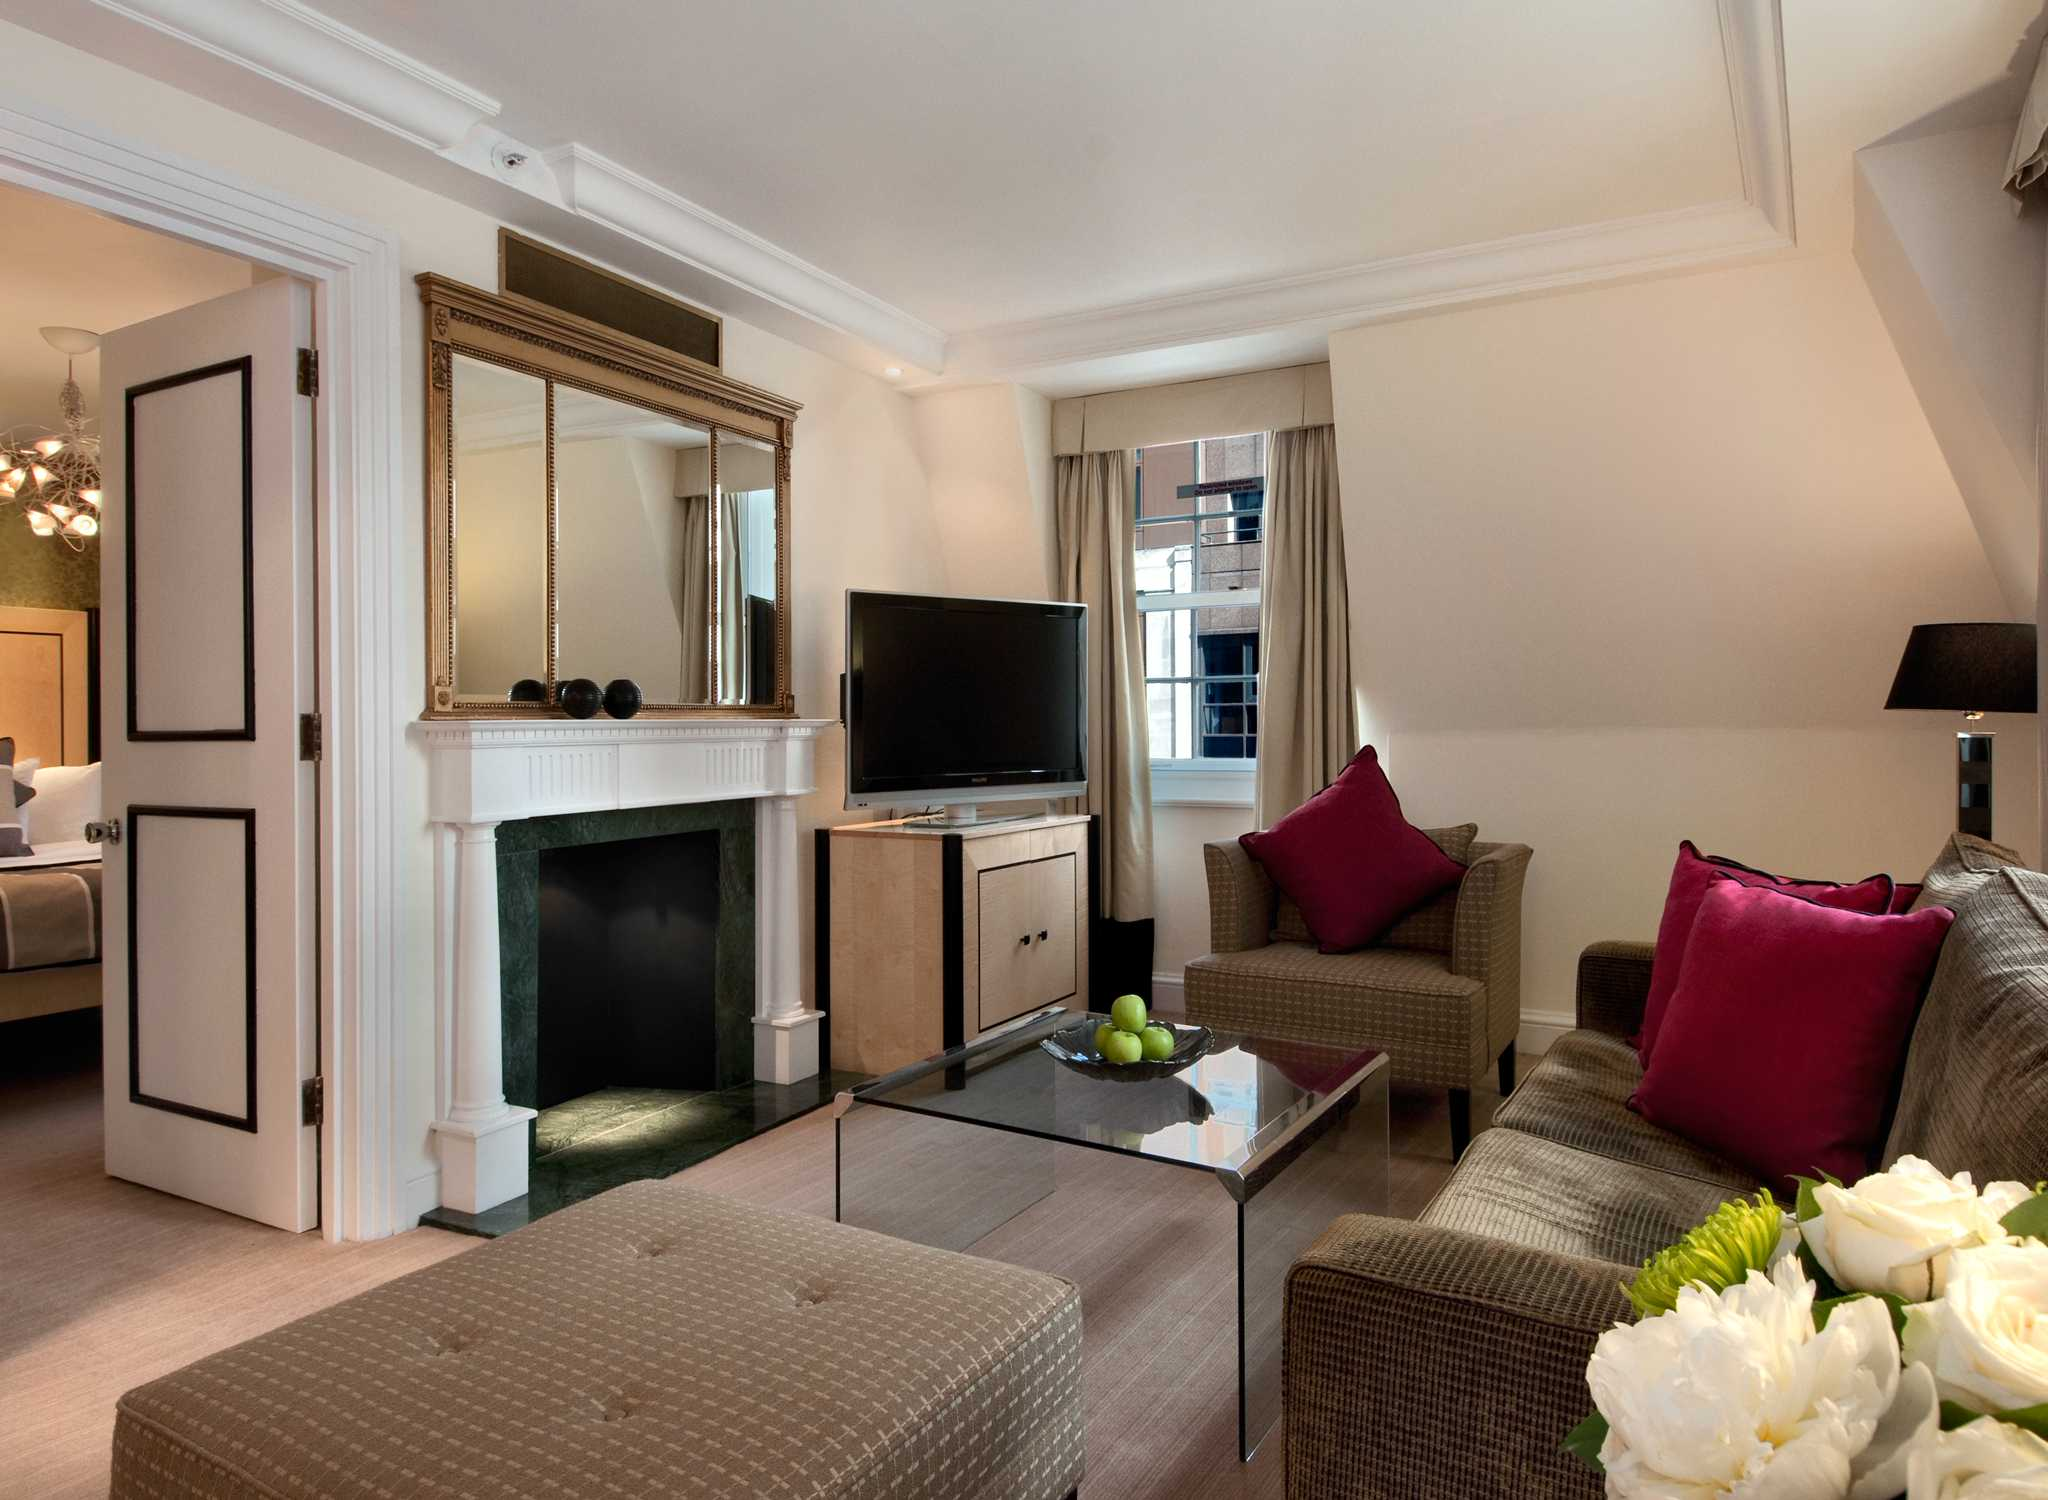 Hotel a Londra - Hotel London Metropole - West London, Regno Unito